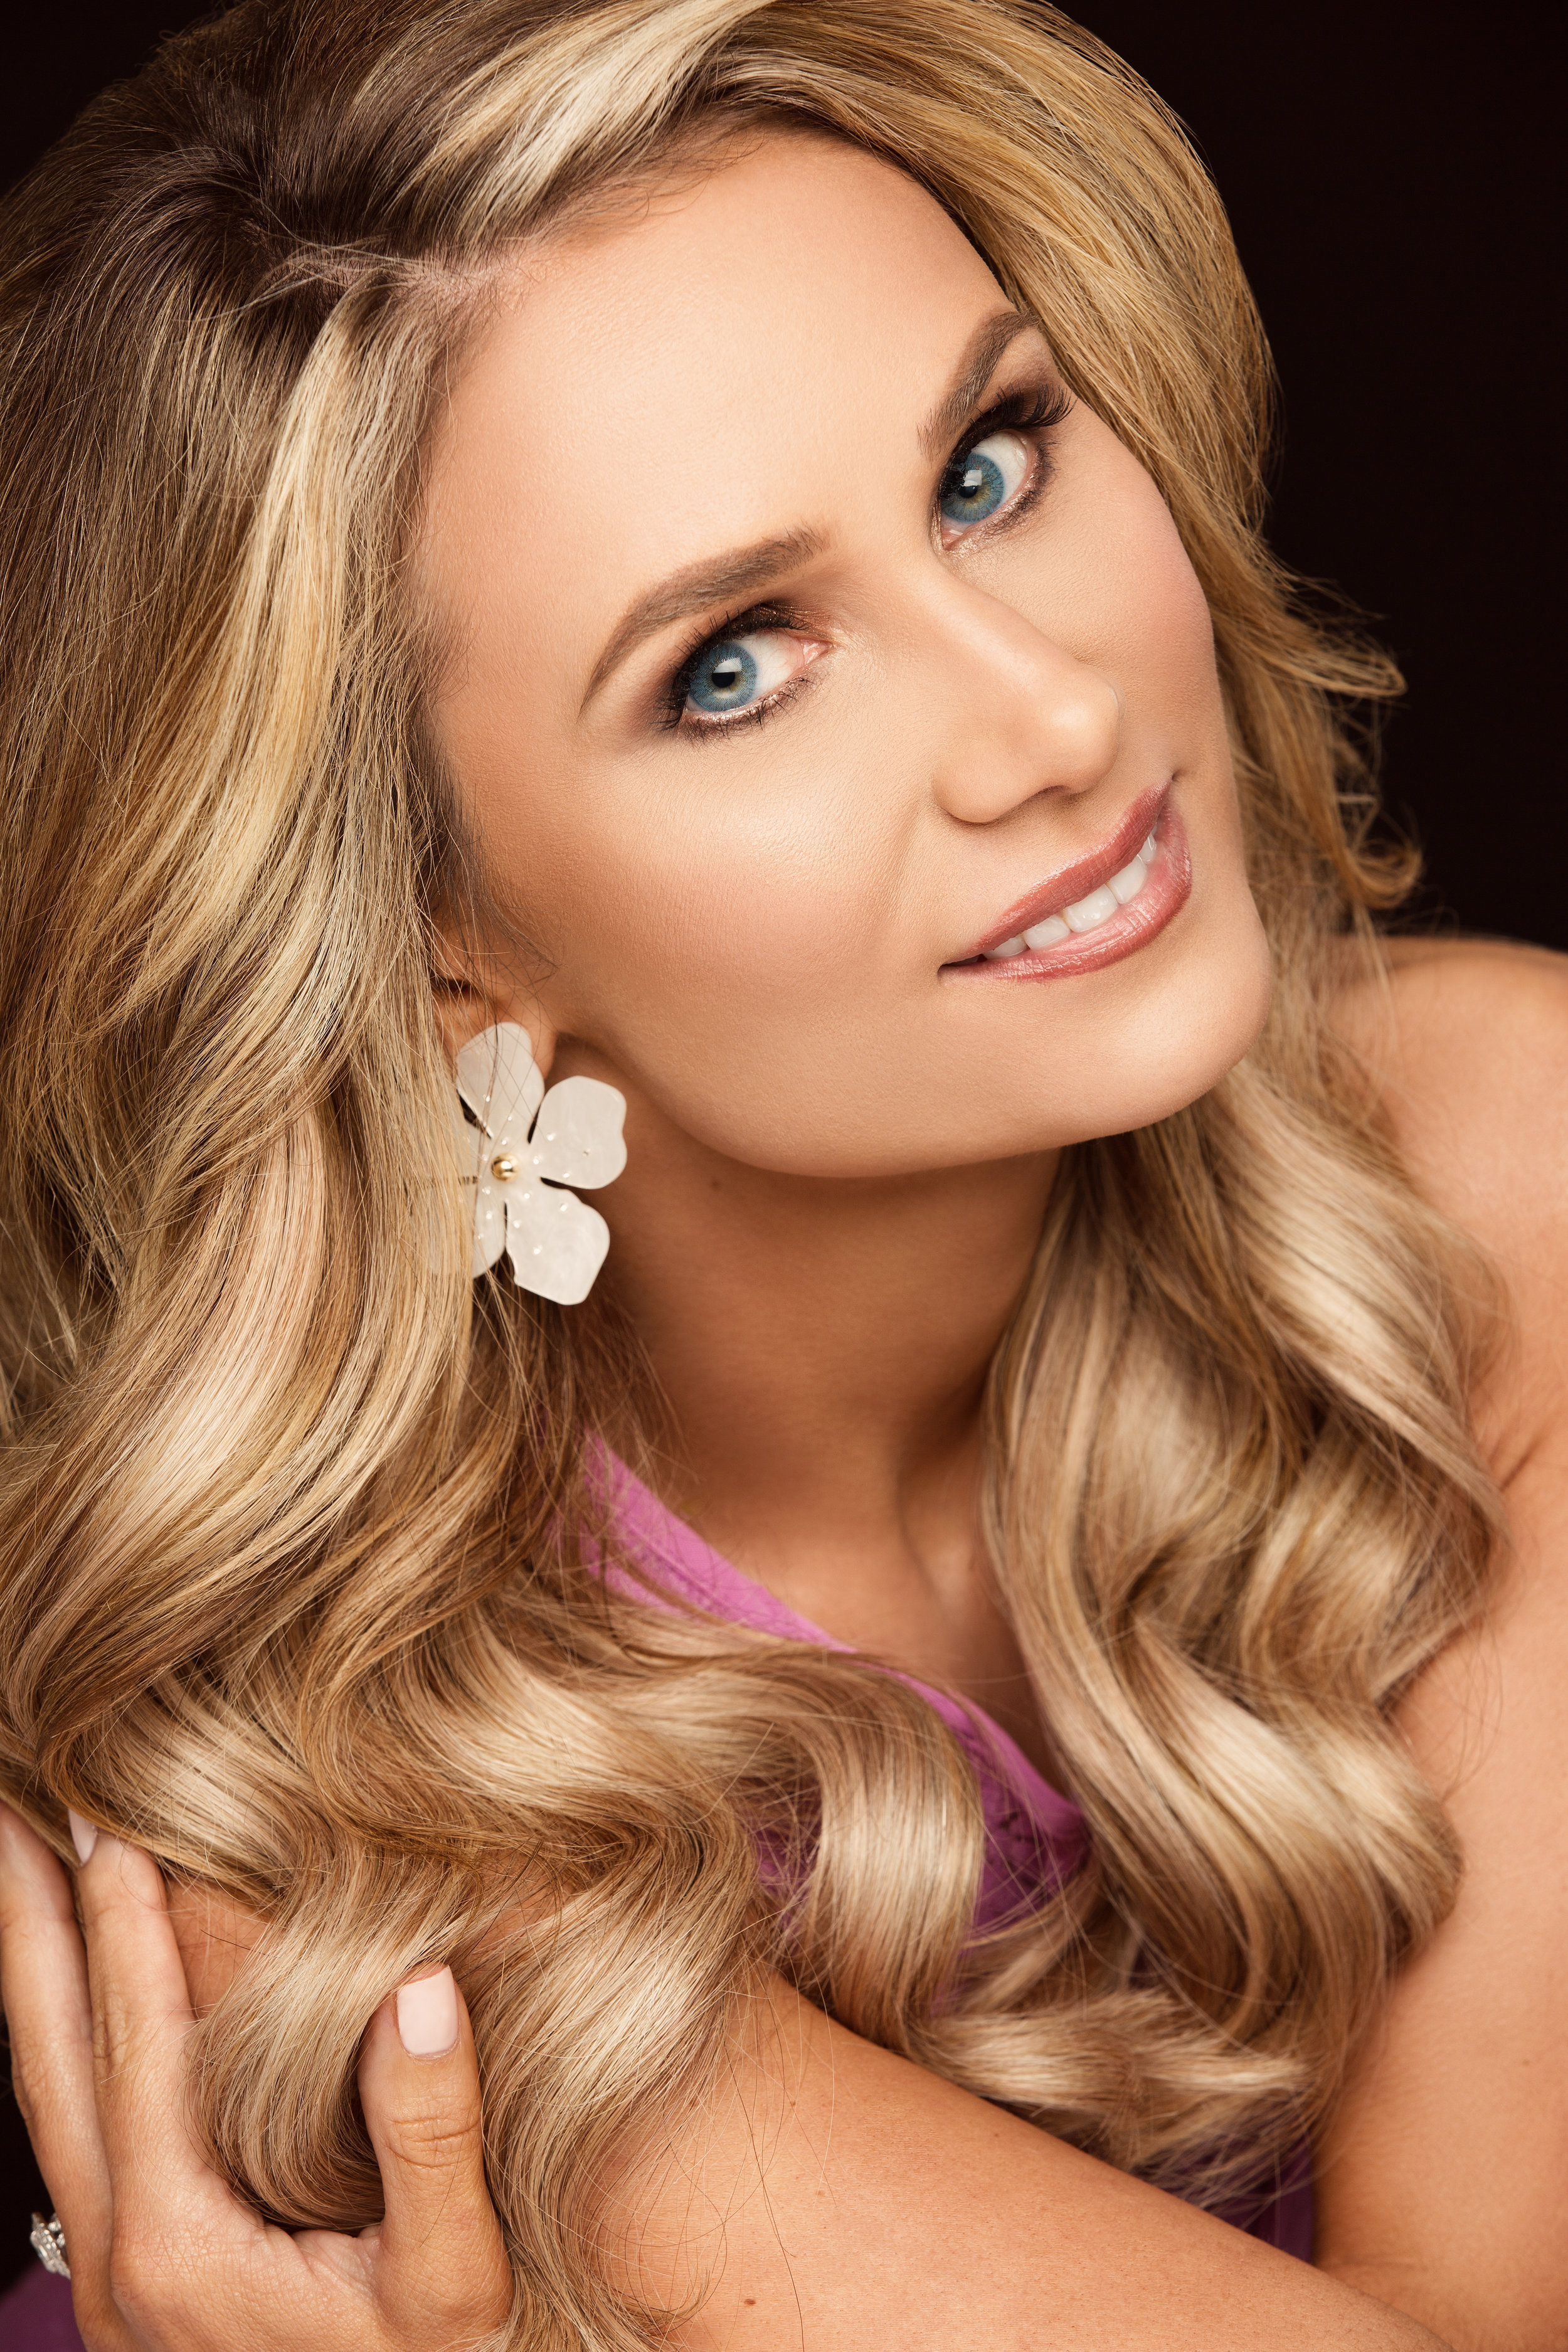 Brookley - 2020 Ms. Royalty International & National Commercial Model Winner